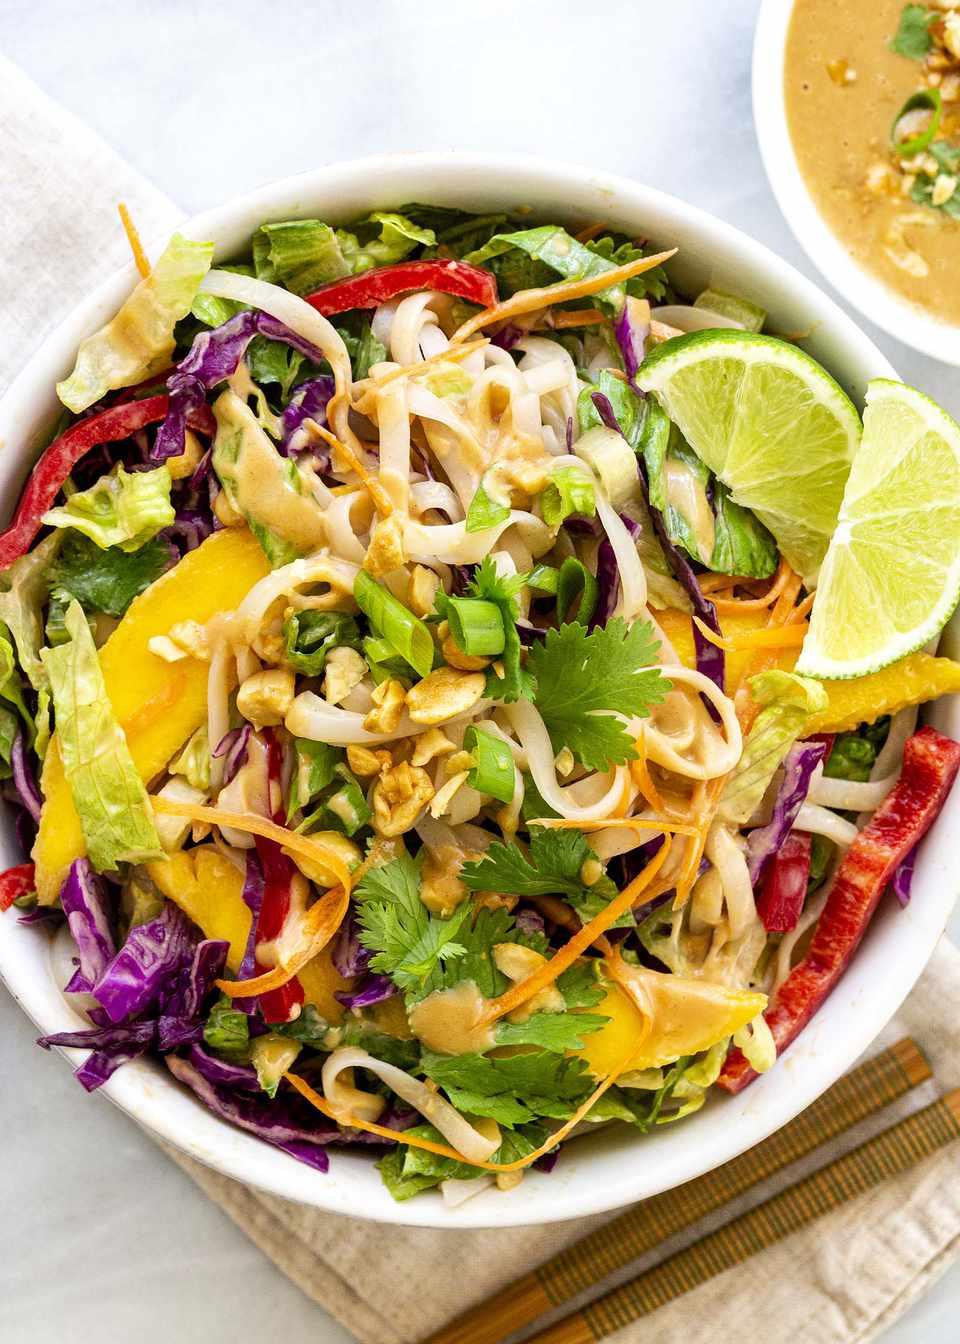 How to Make a Thai Noodle Salad